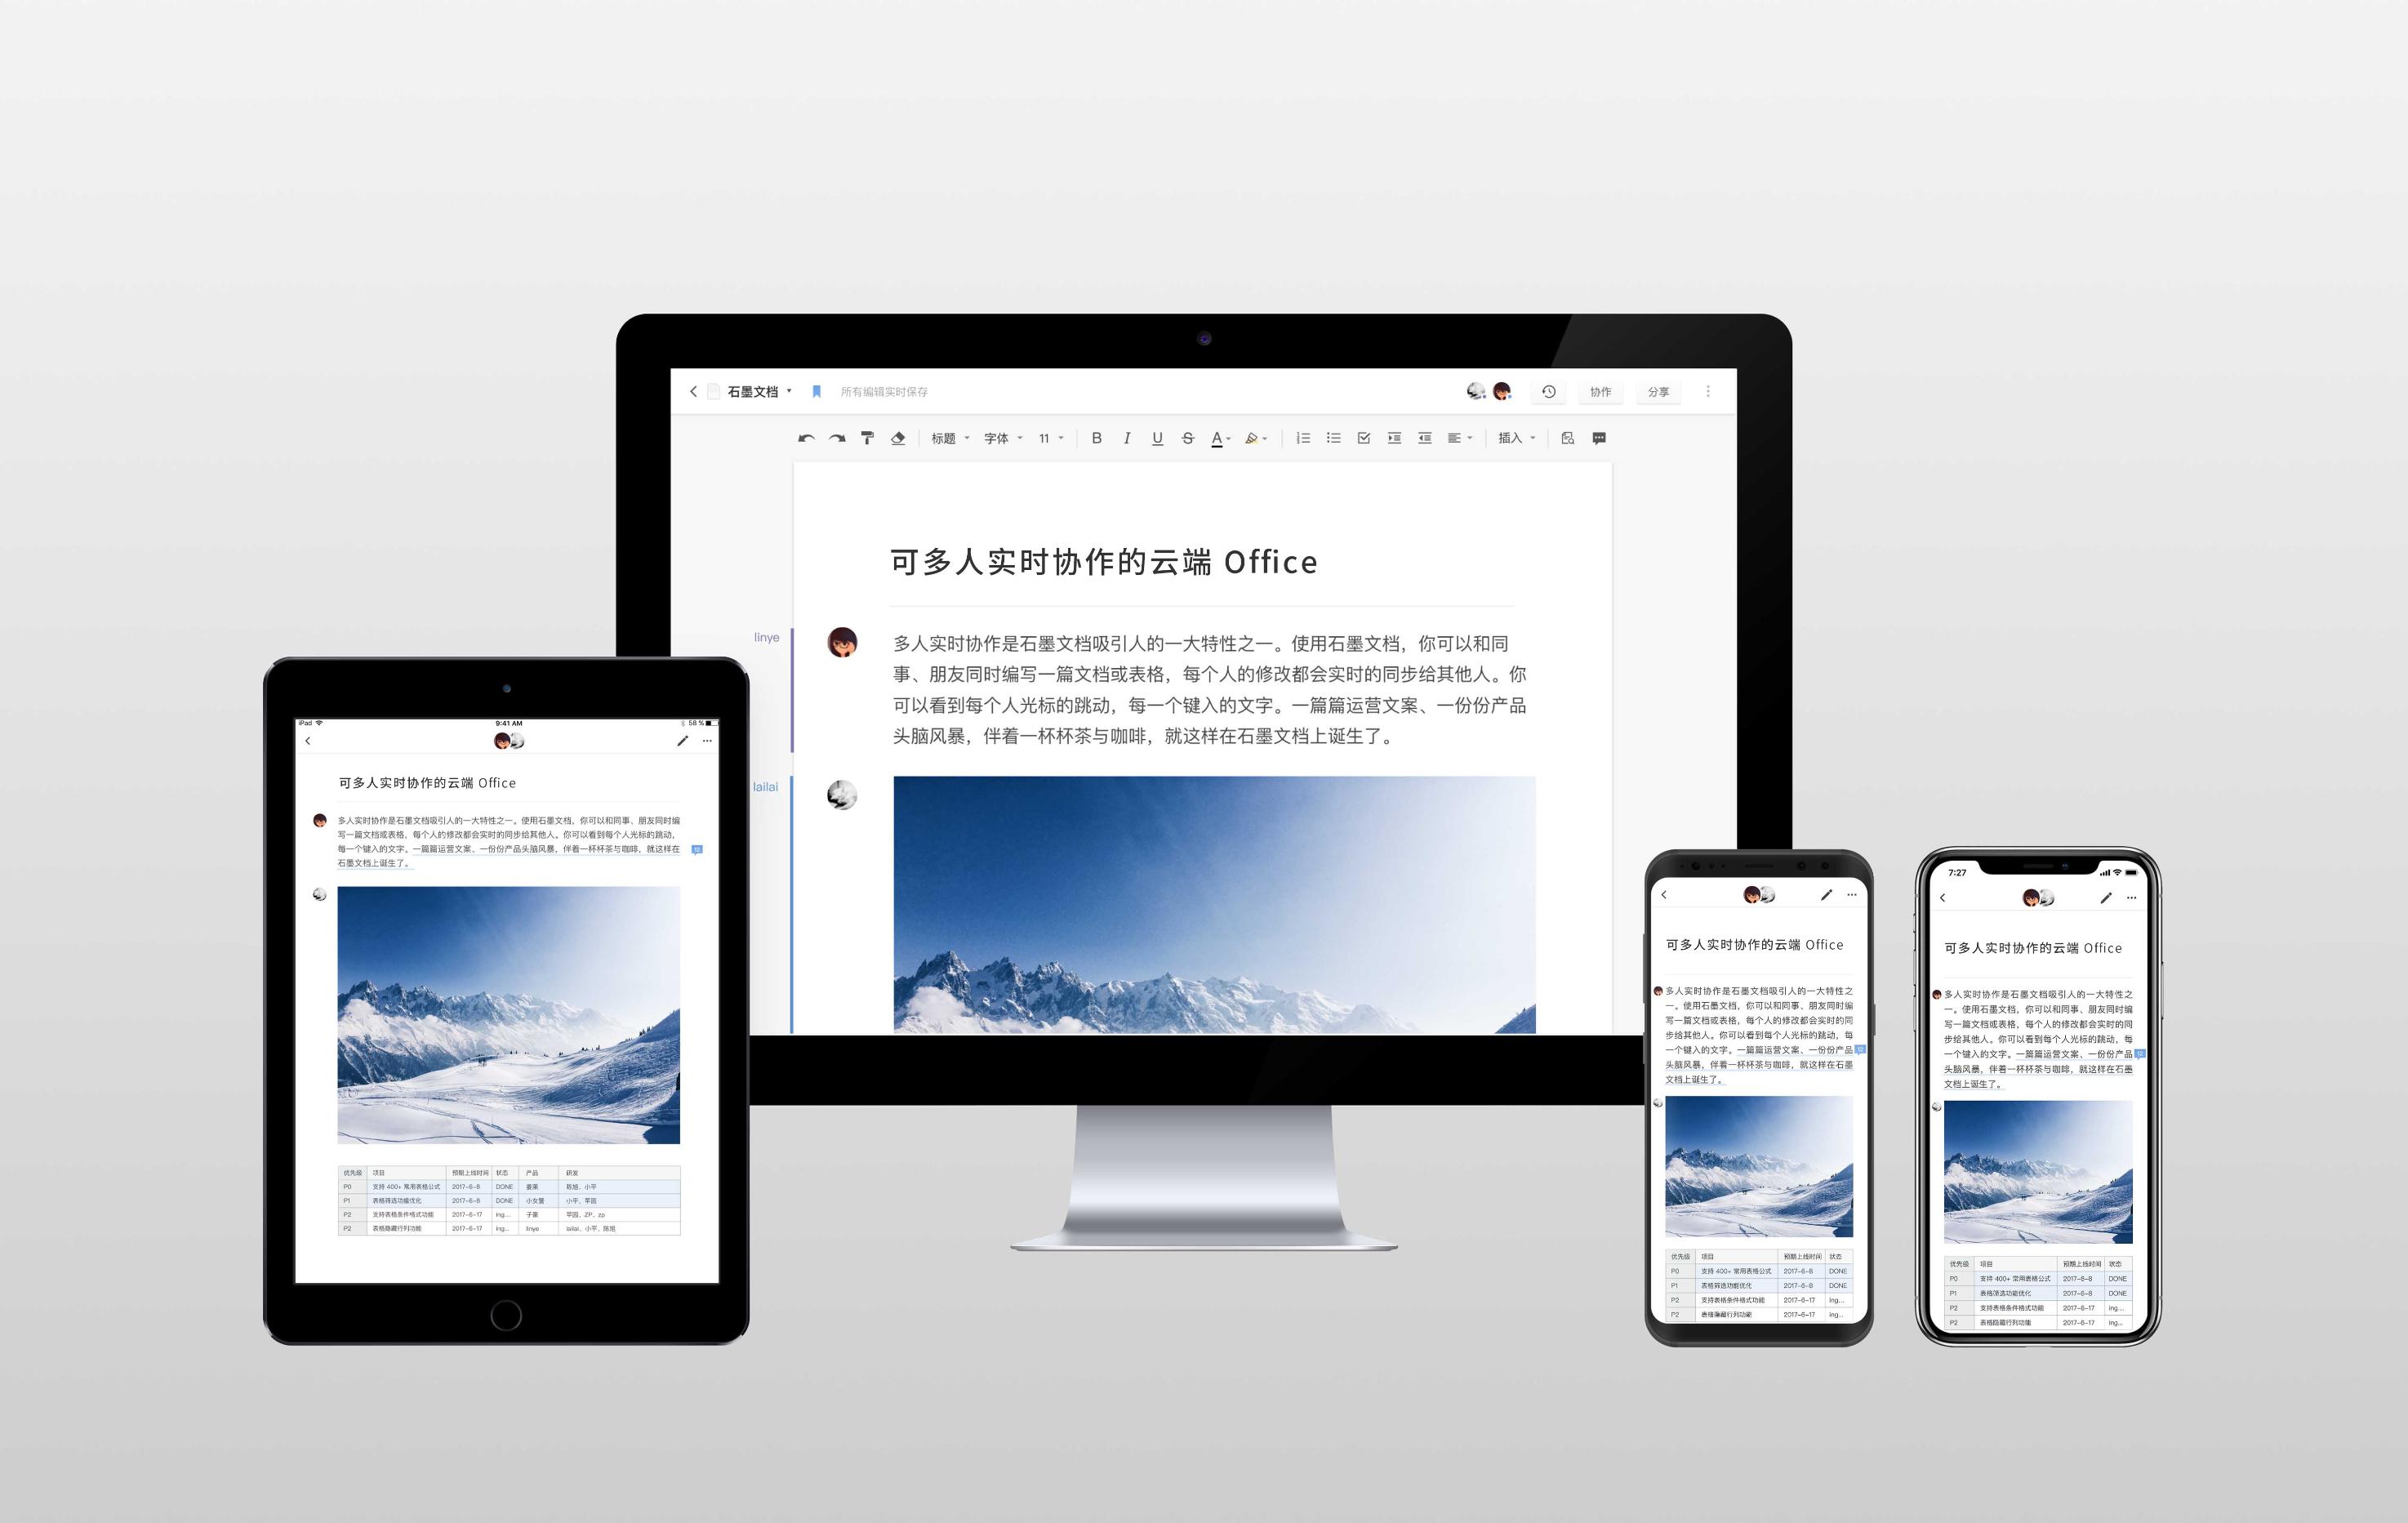 【ToB快讯】石墨文档完成 B+ 轮数千万美金融资,持续打造新一代云端 Office 软件